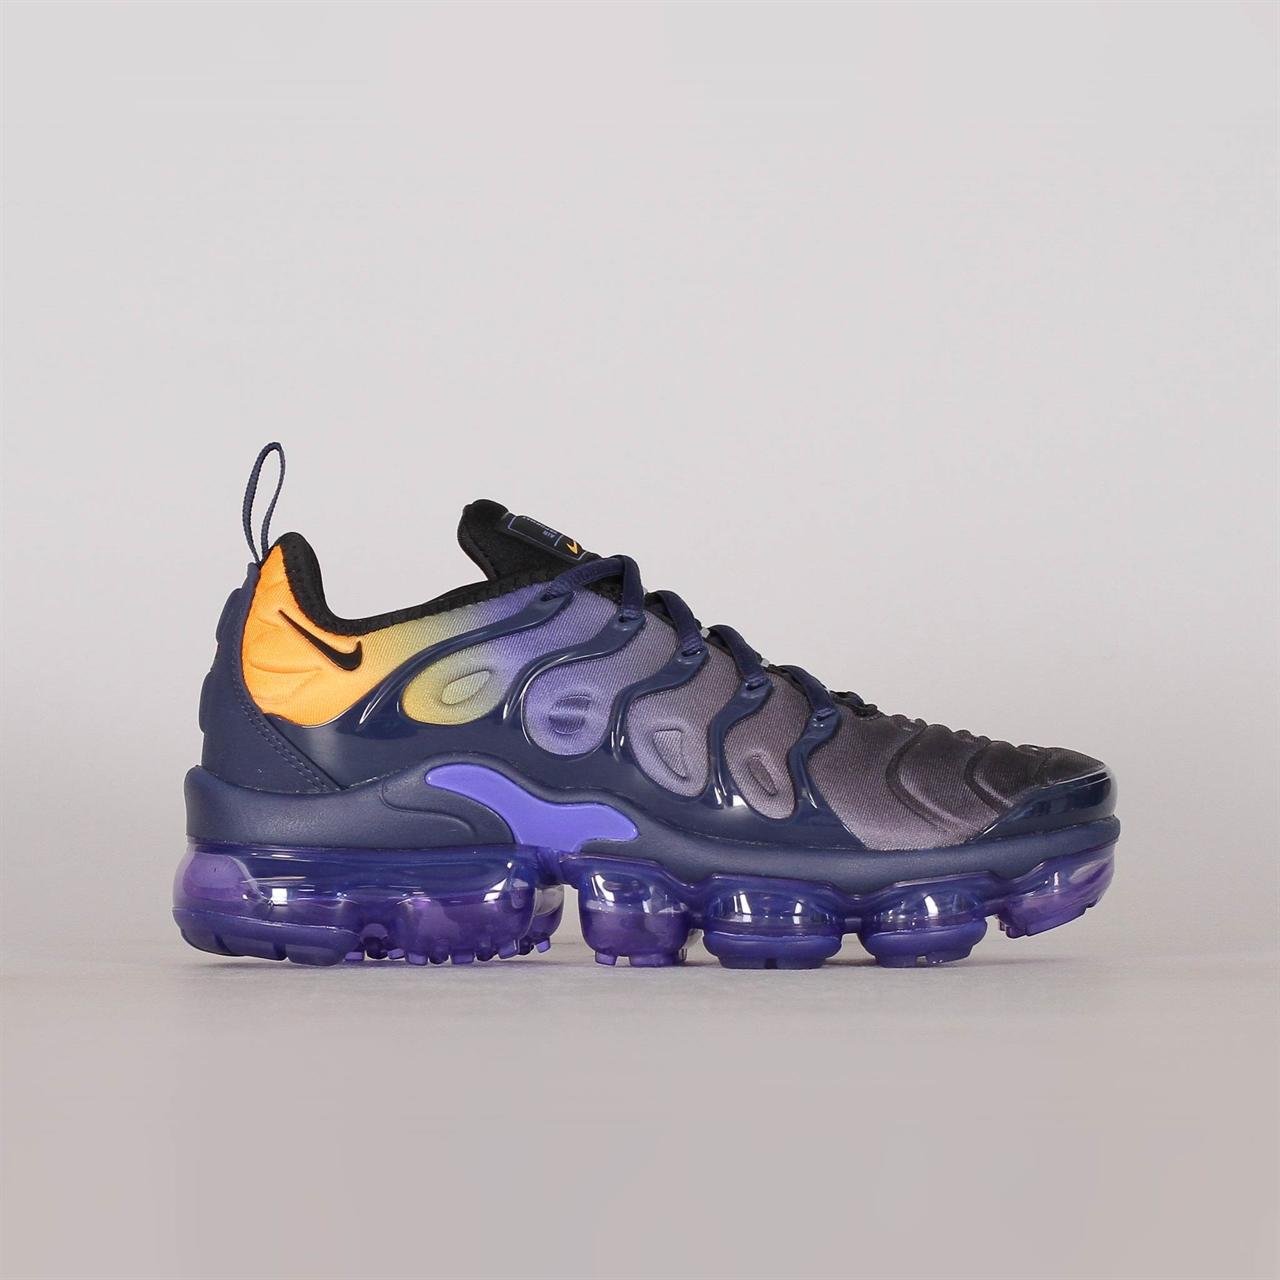 349a394fcd9 Shelta - Nike Womens Air Vapormax Plus (AO4550-500)